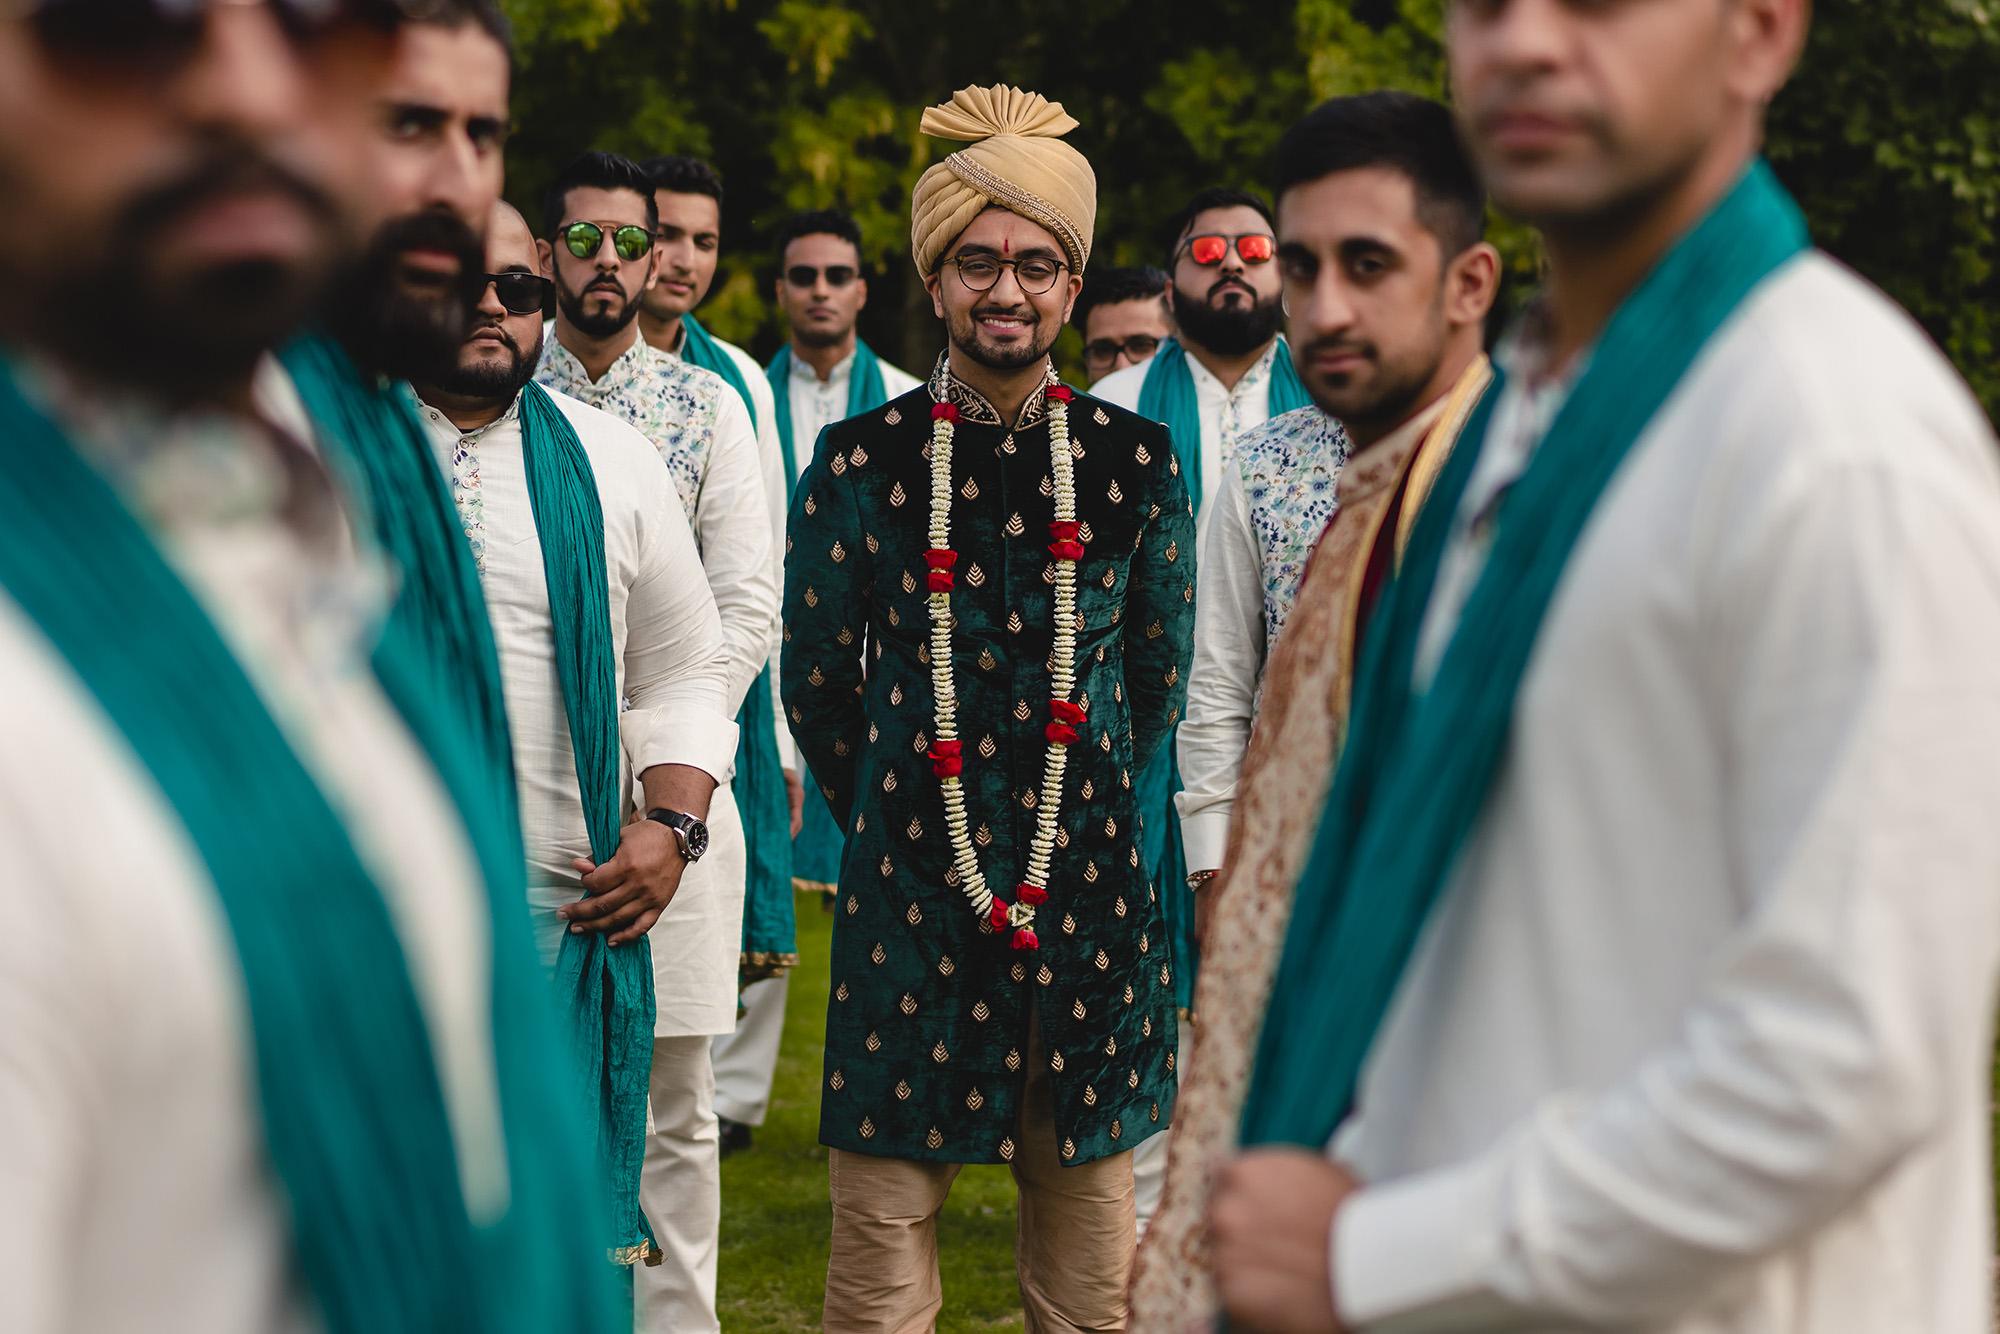 groom portrait amongst groomsmen